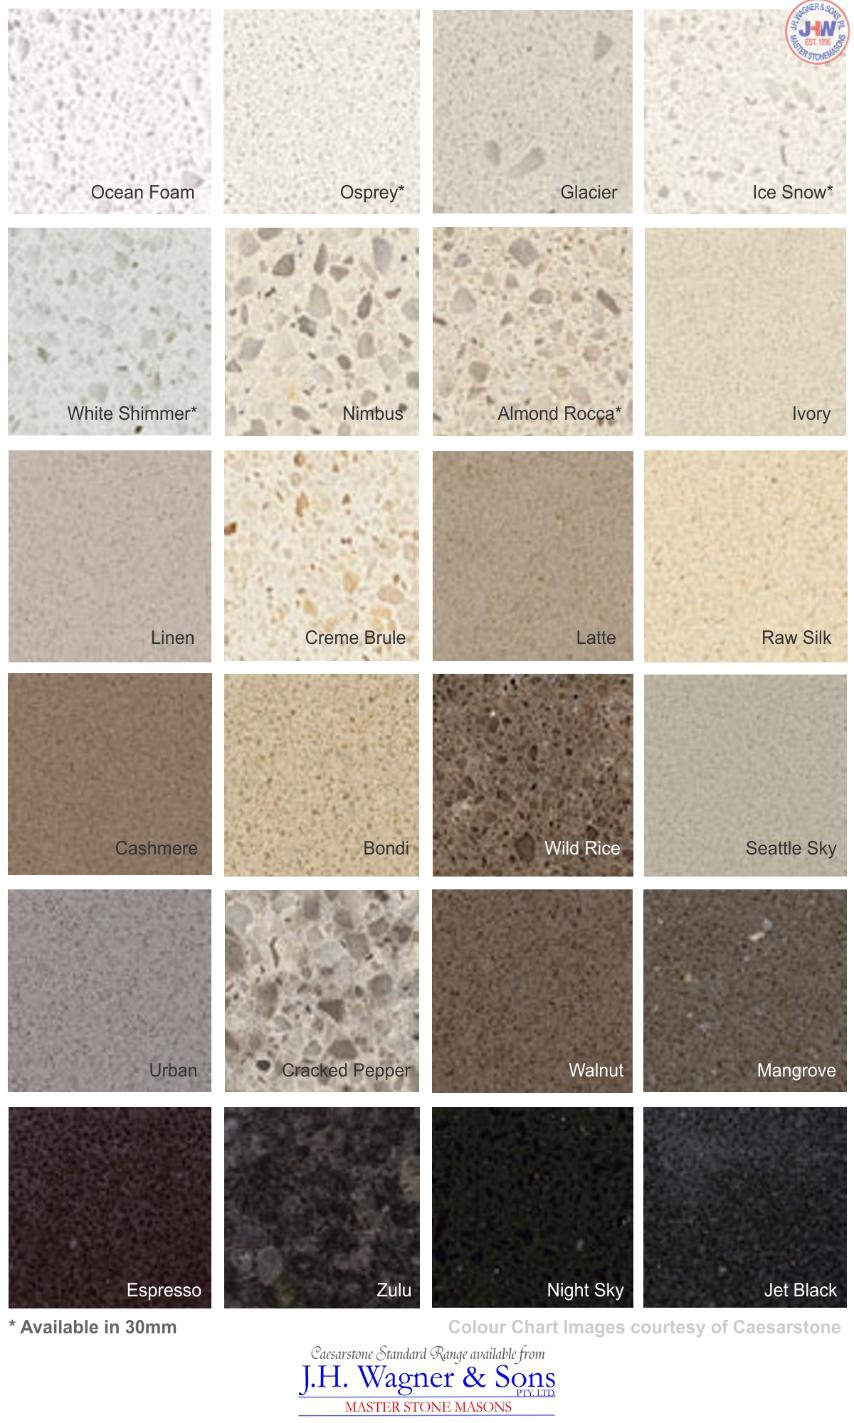 Granite Colours For Kitchen Benchtops Similiar Caesarstone Colours Keywords